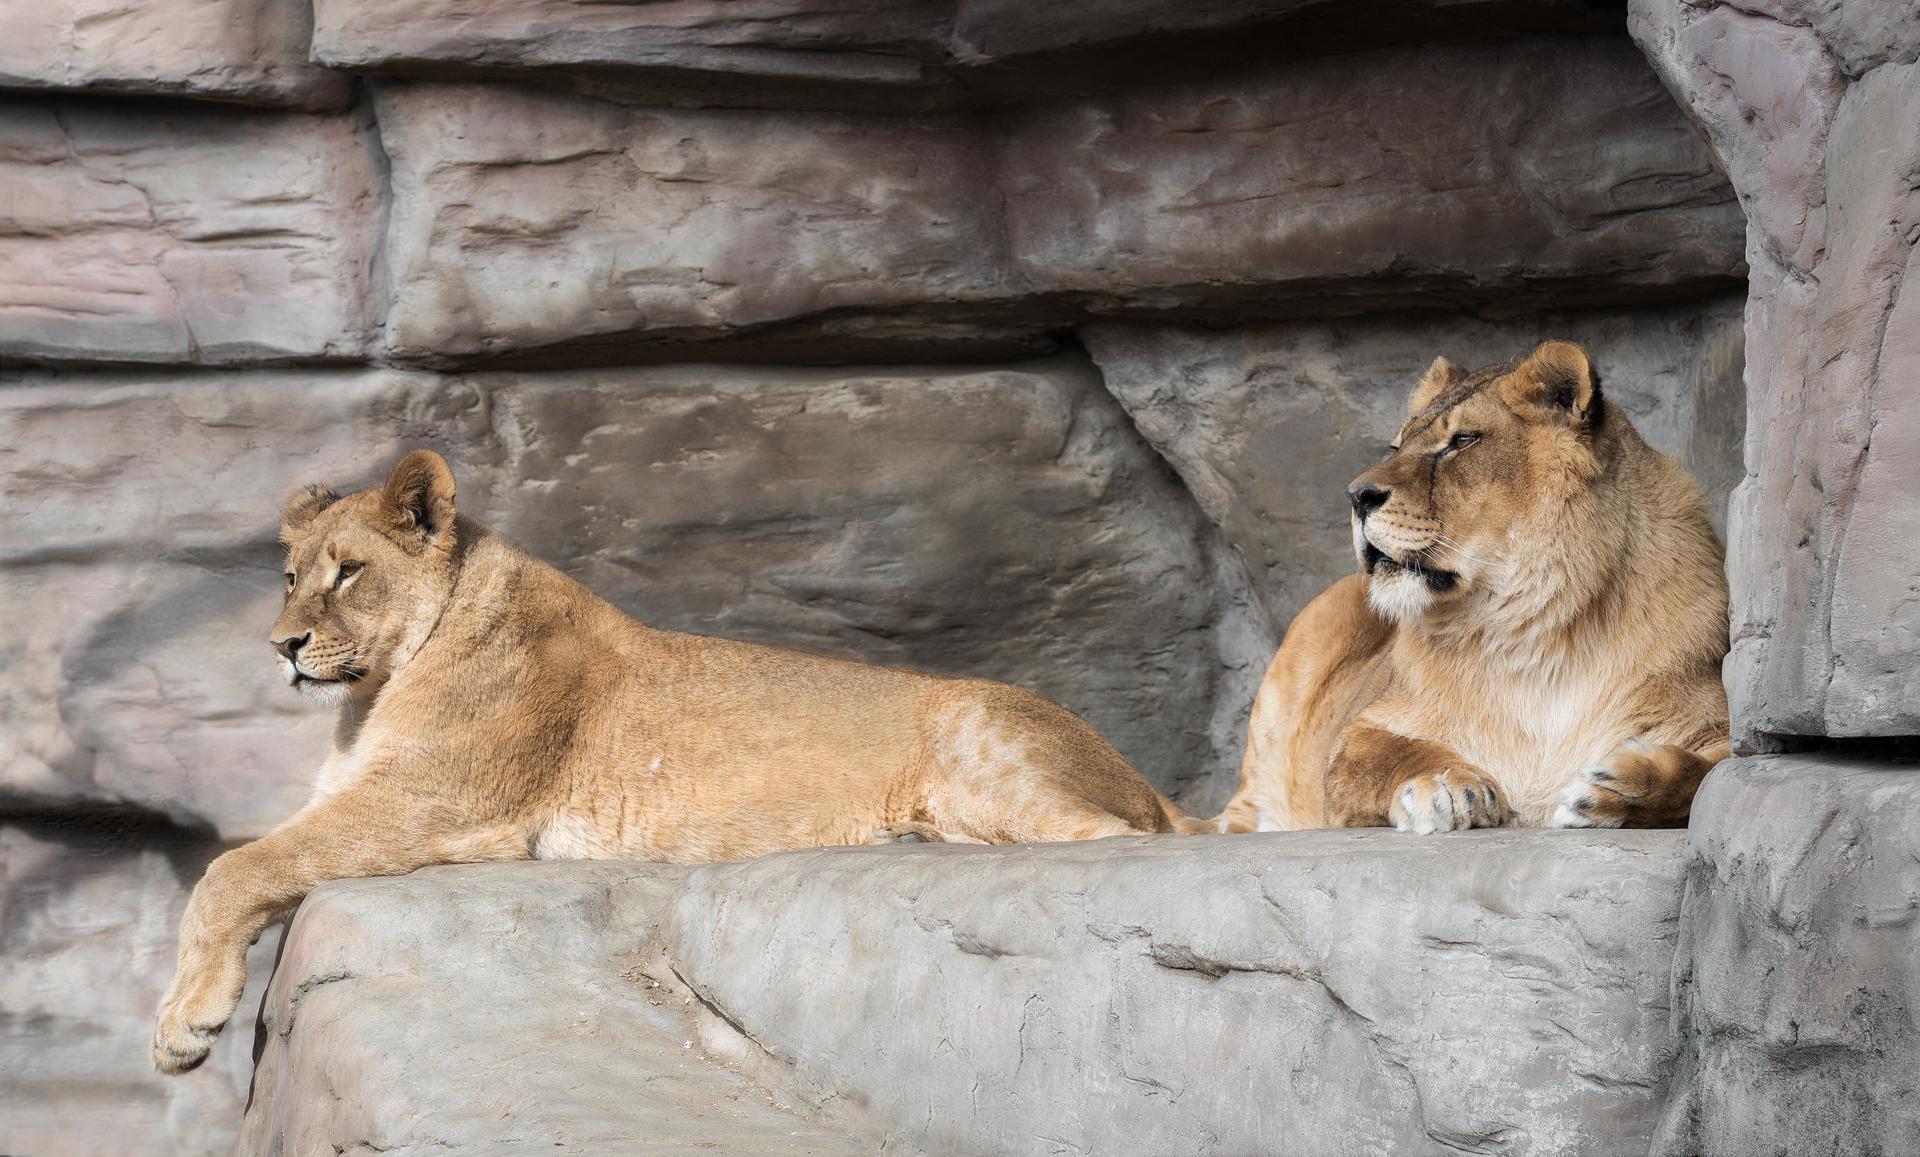 cat ,wild, wildanimal, wildanimals, wildlife, wildlifephotography, wild_animal,wildanimalphotography, кот, беларусь,минский зоопарк,тигр ,minsk zoo, belarus,lionesses,lion,львы,львицы, Хрол Полина